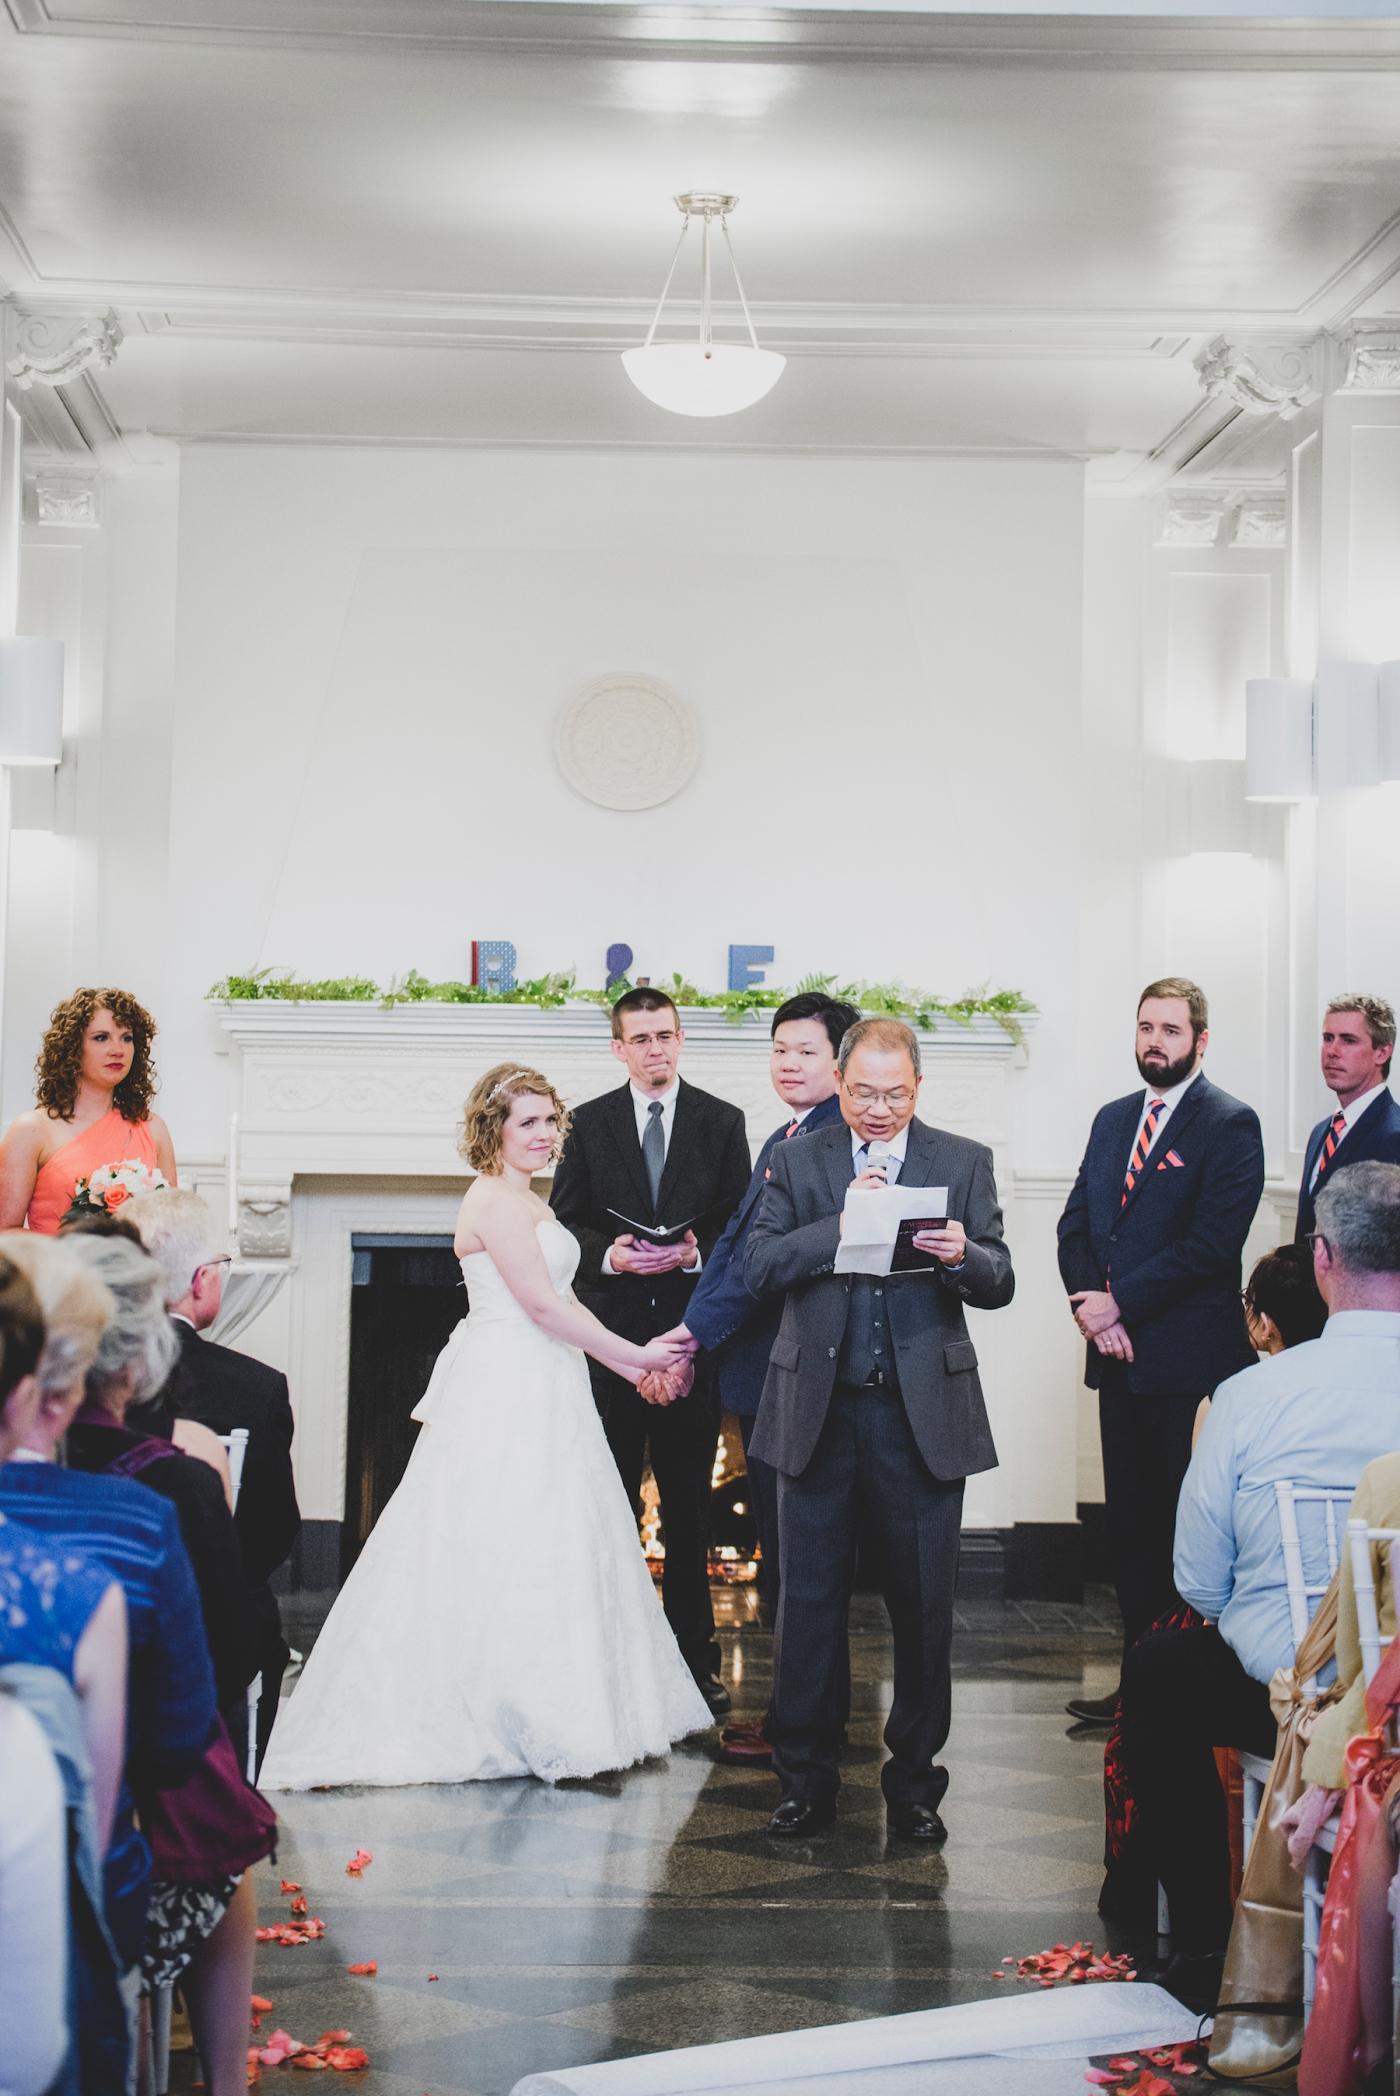 DSC_2596Everett_Wedding_Ballroom_Jane_Speleers_photography_Rachel_and_Edmund_Ceremony_2017